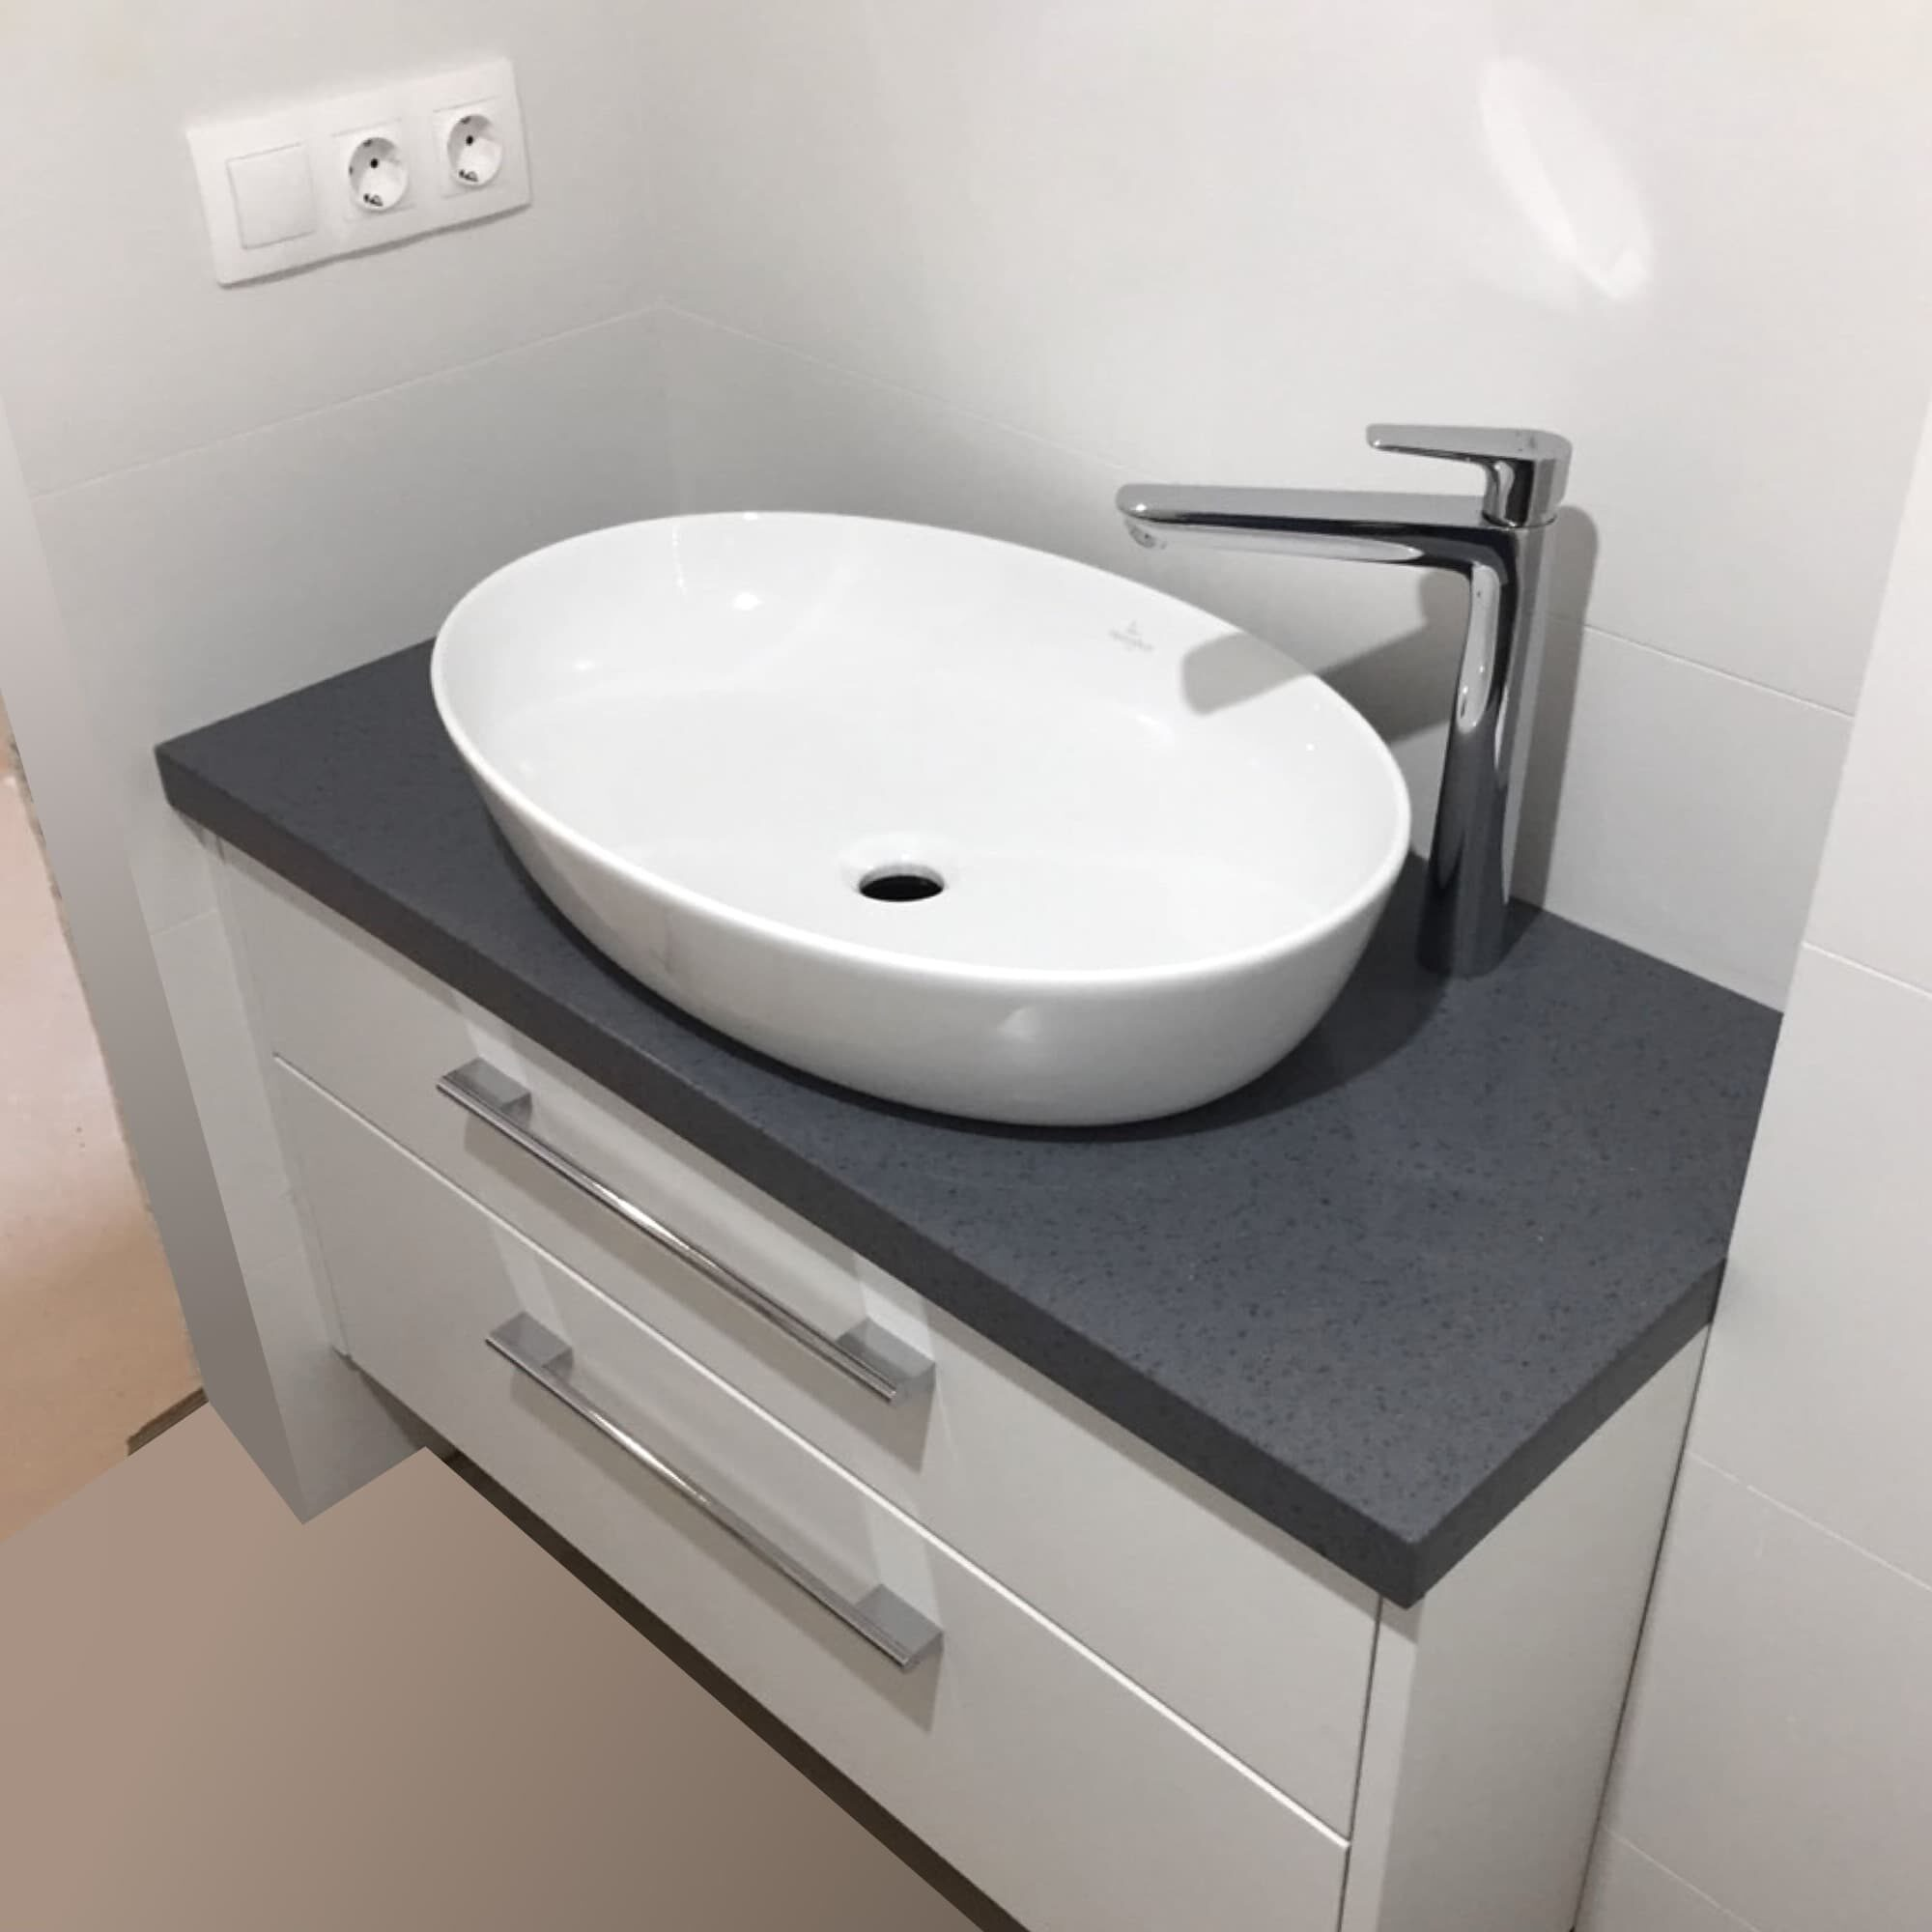 Тумба в ванную под раковину-чашу Villeroy & Boch